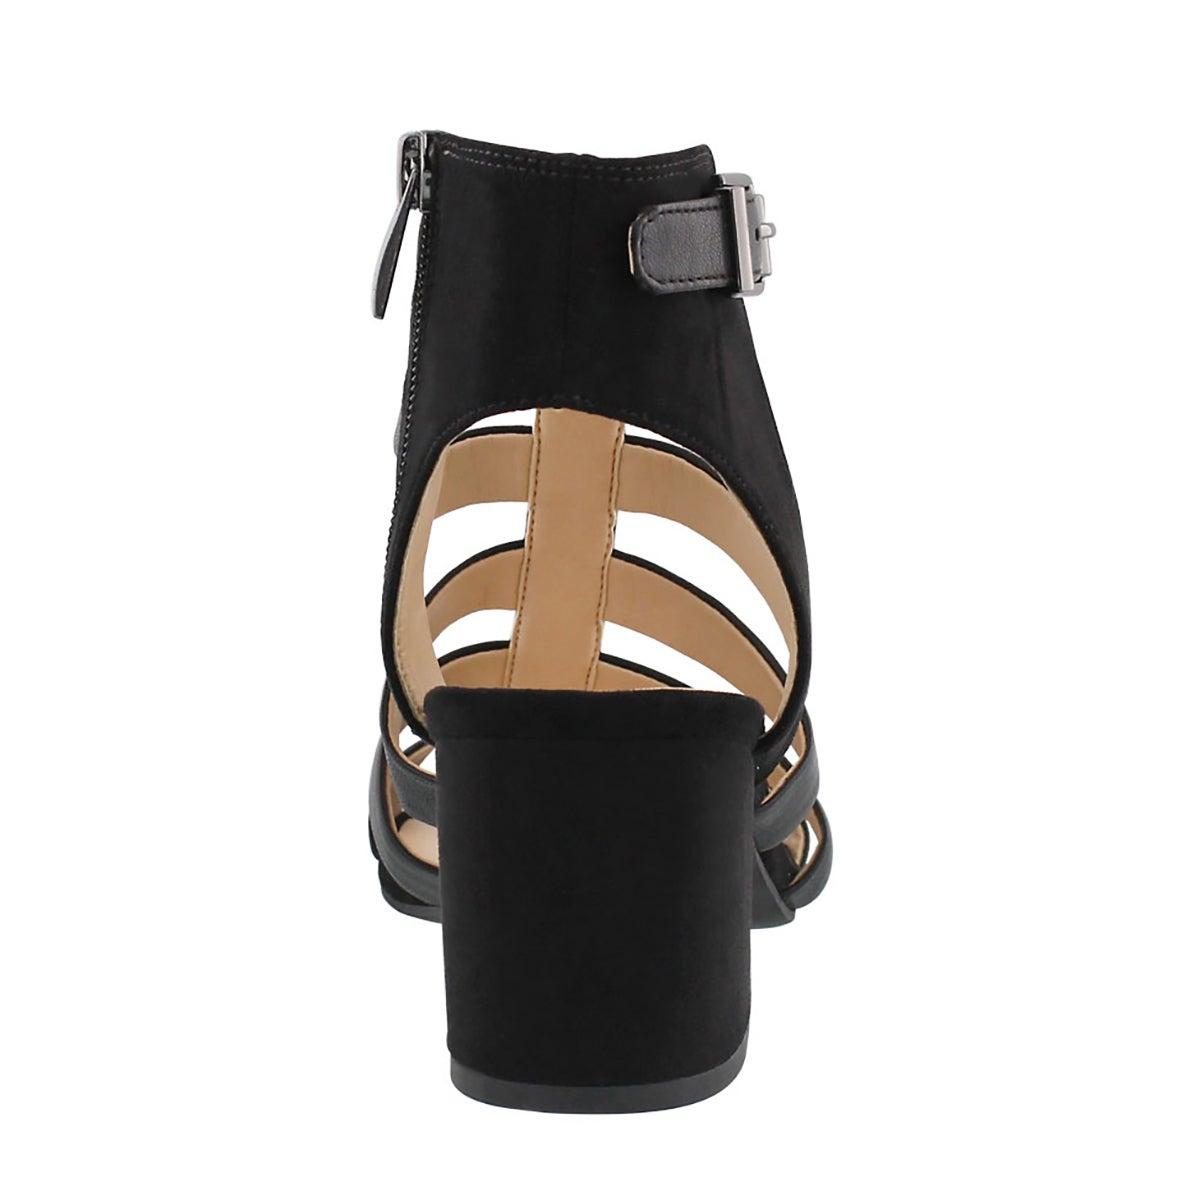 Lds Mesa black dress sandal